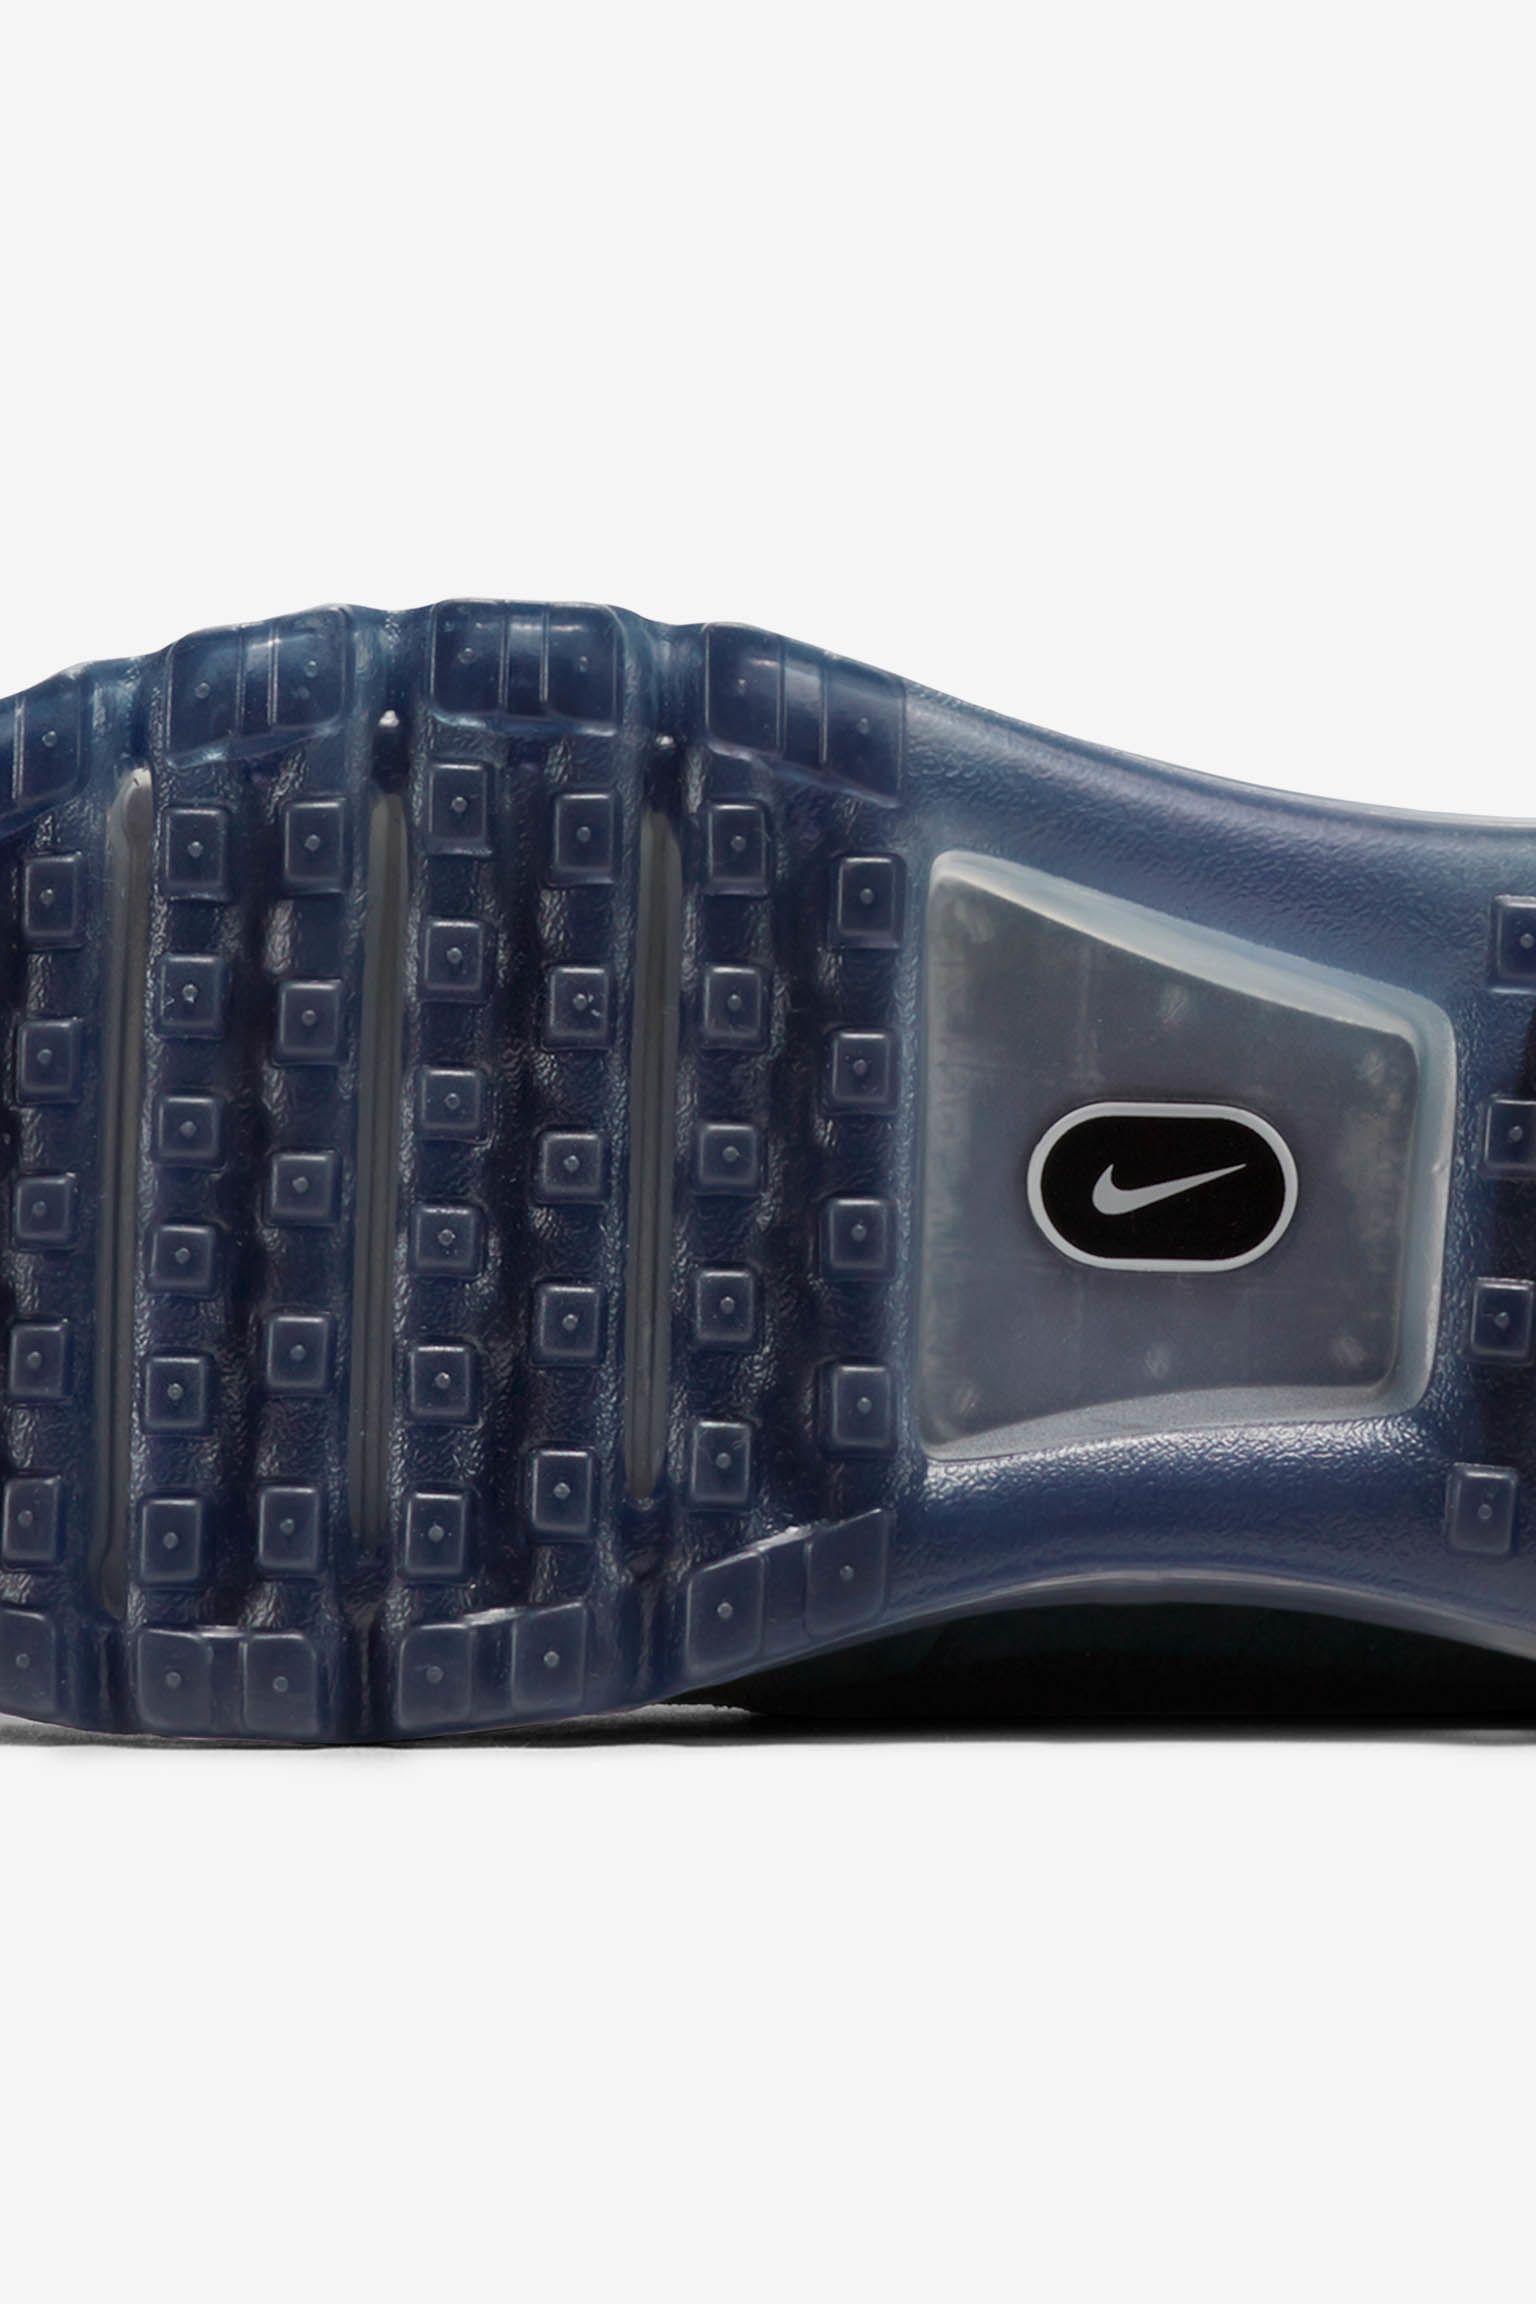 Nike Air Max LD-Zero H 'Black & Dark Grey'